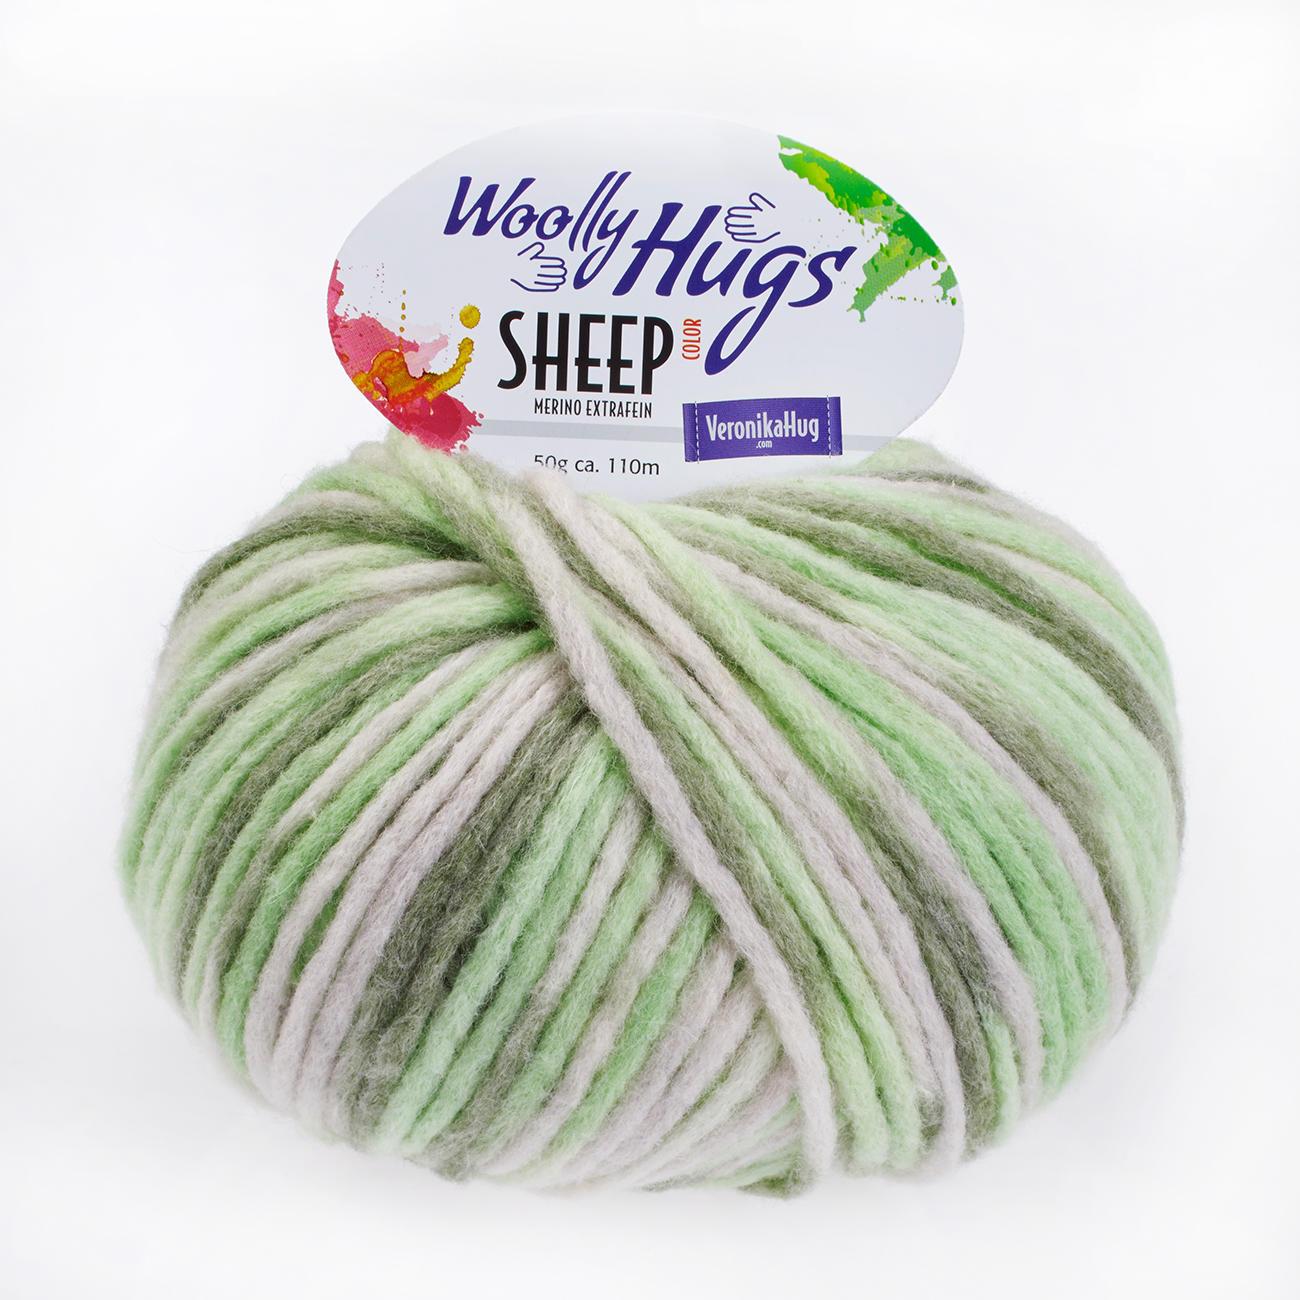 Woolly Hugs Sheep Color Merino extrafein 50g Farbe 80